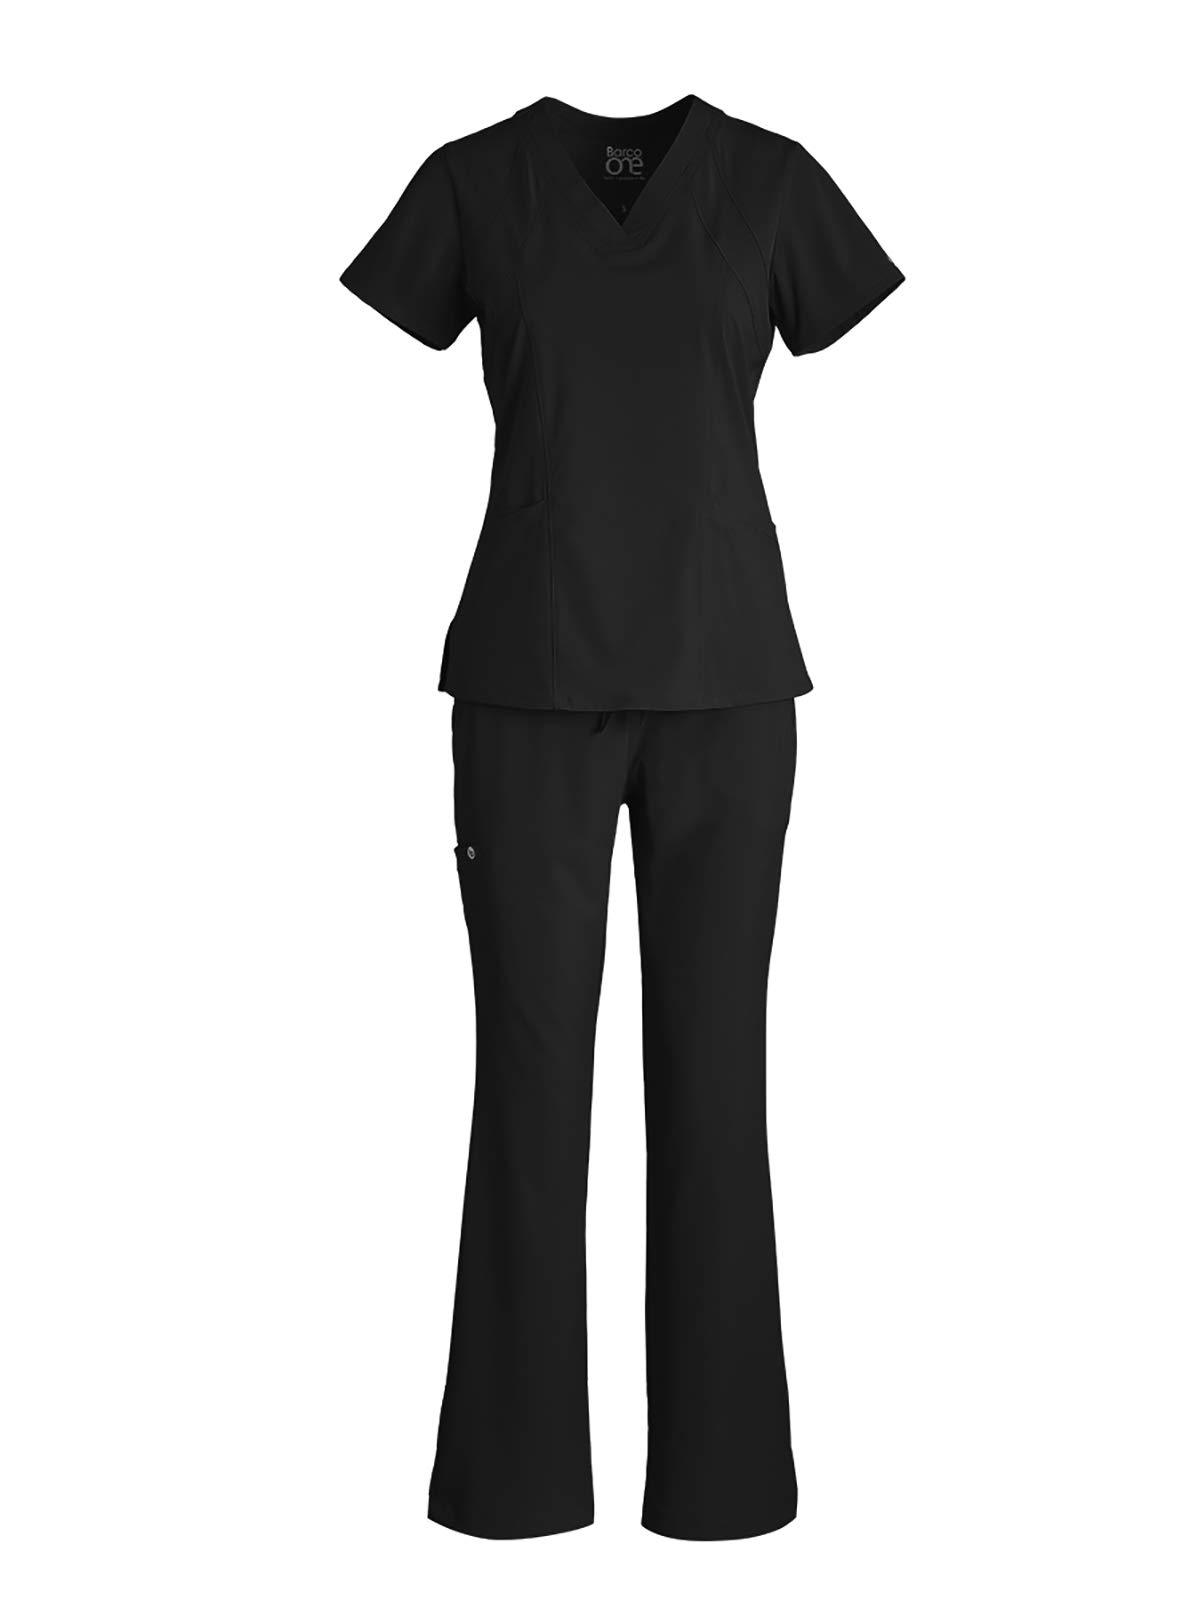 BARCO One Bundle – V-Neck Top + Midrise Cargo Pant Medical Scrub Set for Women